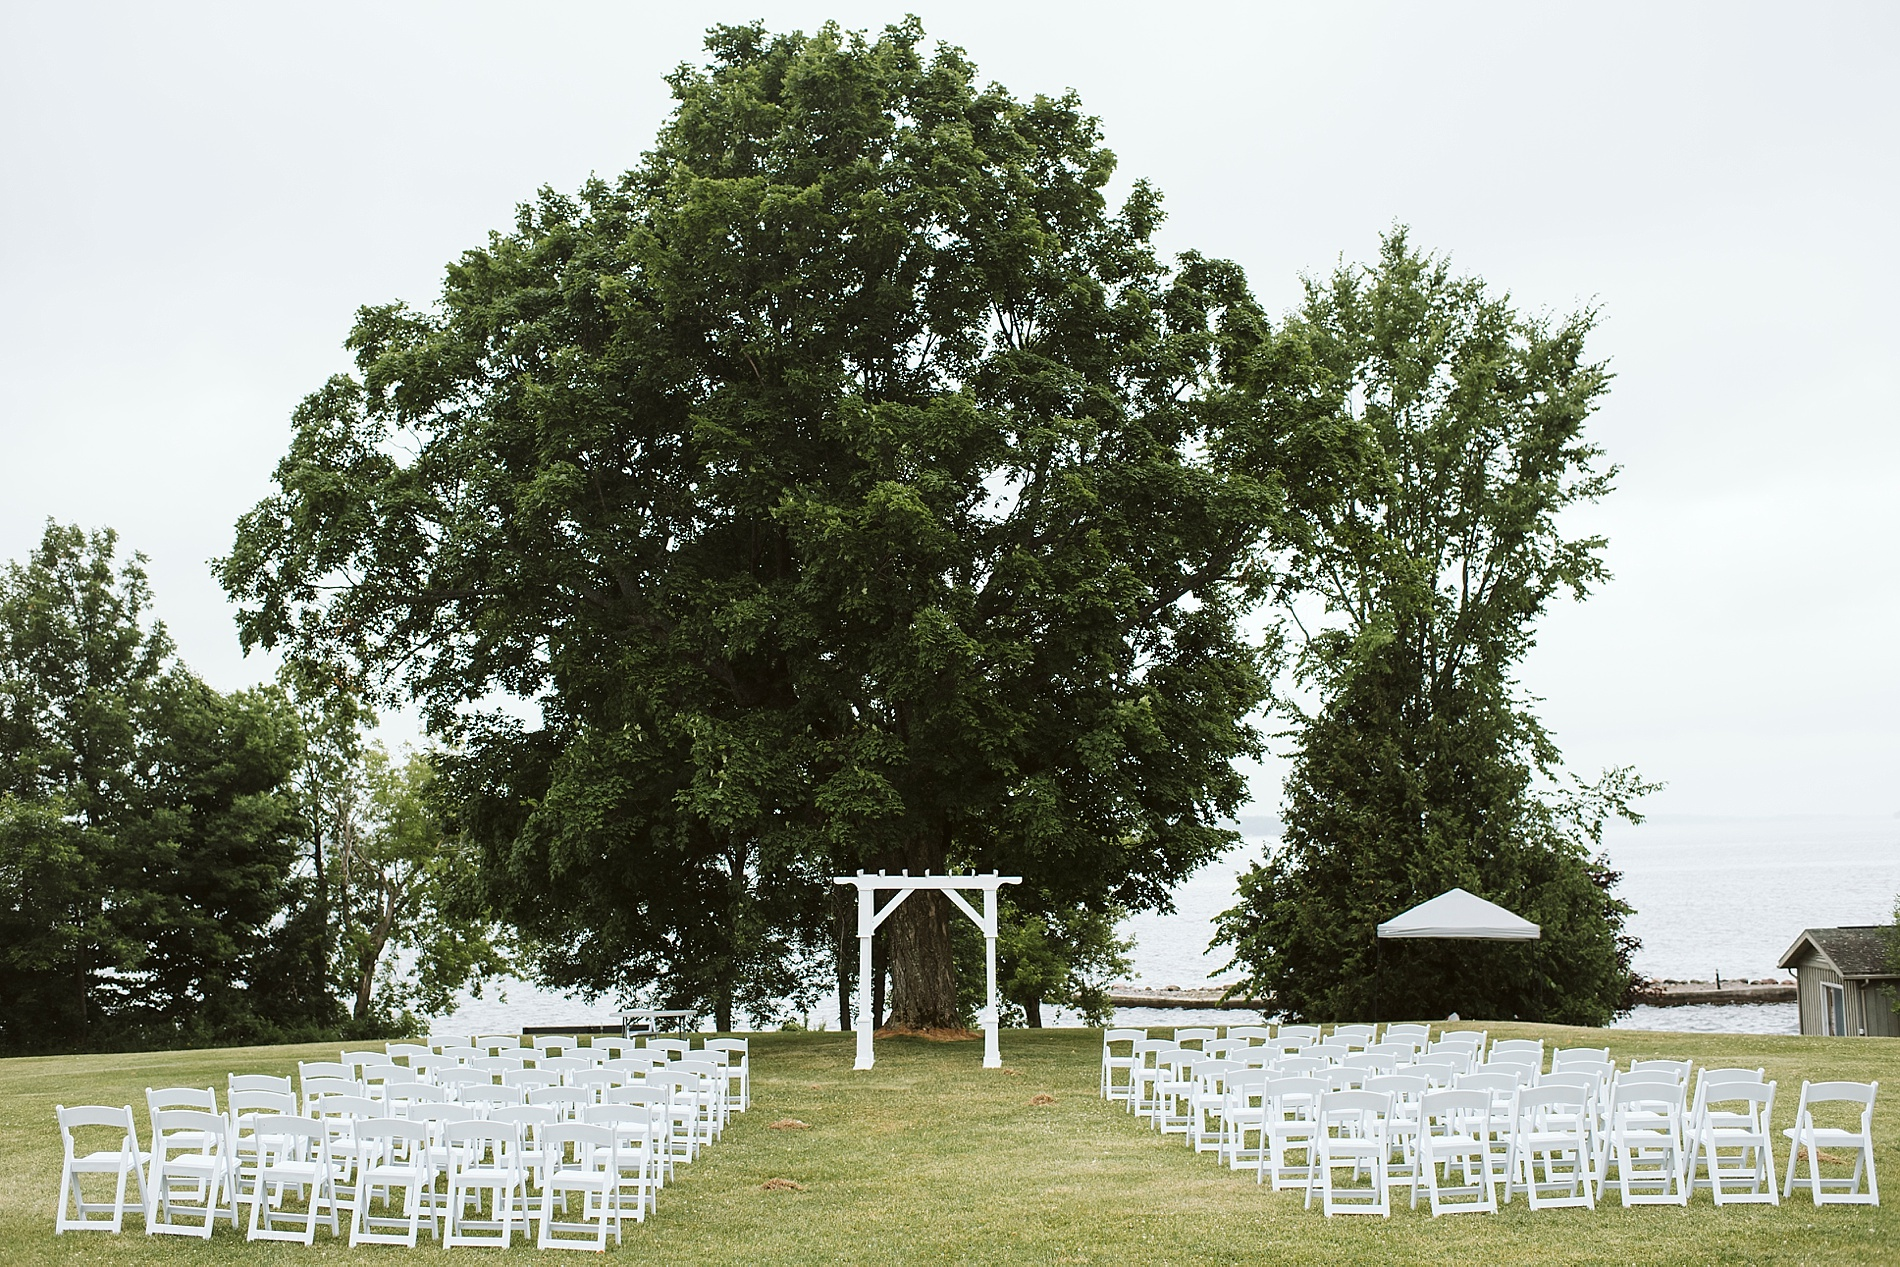 Kawartha_Lakes_Wedding_Bobcageon_Eganridge_Resort_Toronto_Photographer_0028.jpg